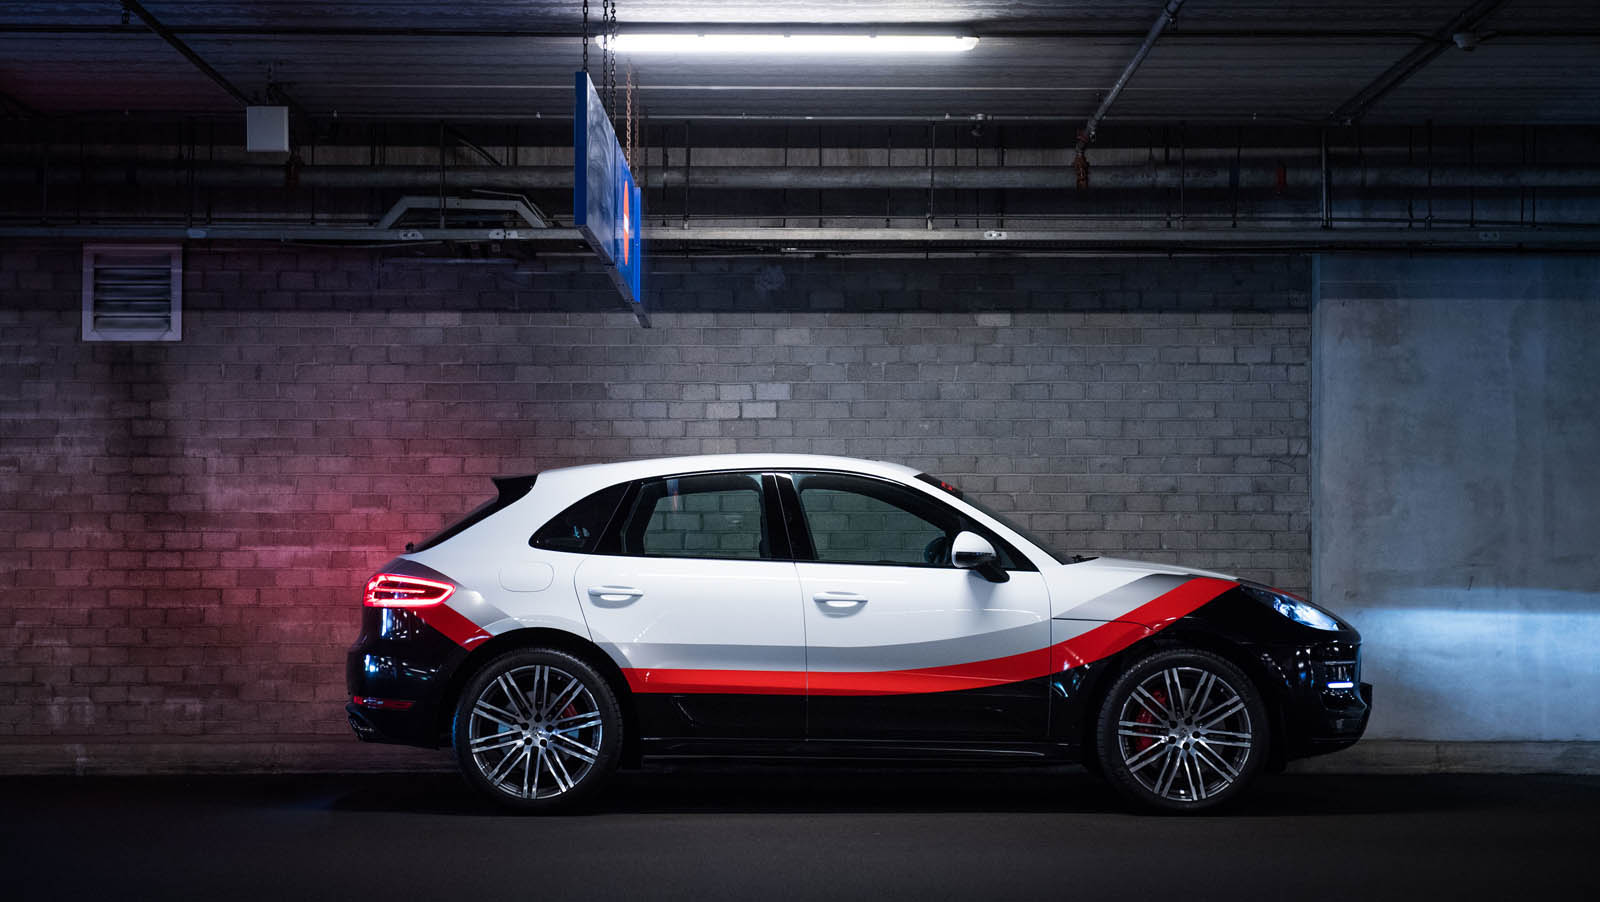 Porsche_Macan_Special_livery_01